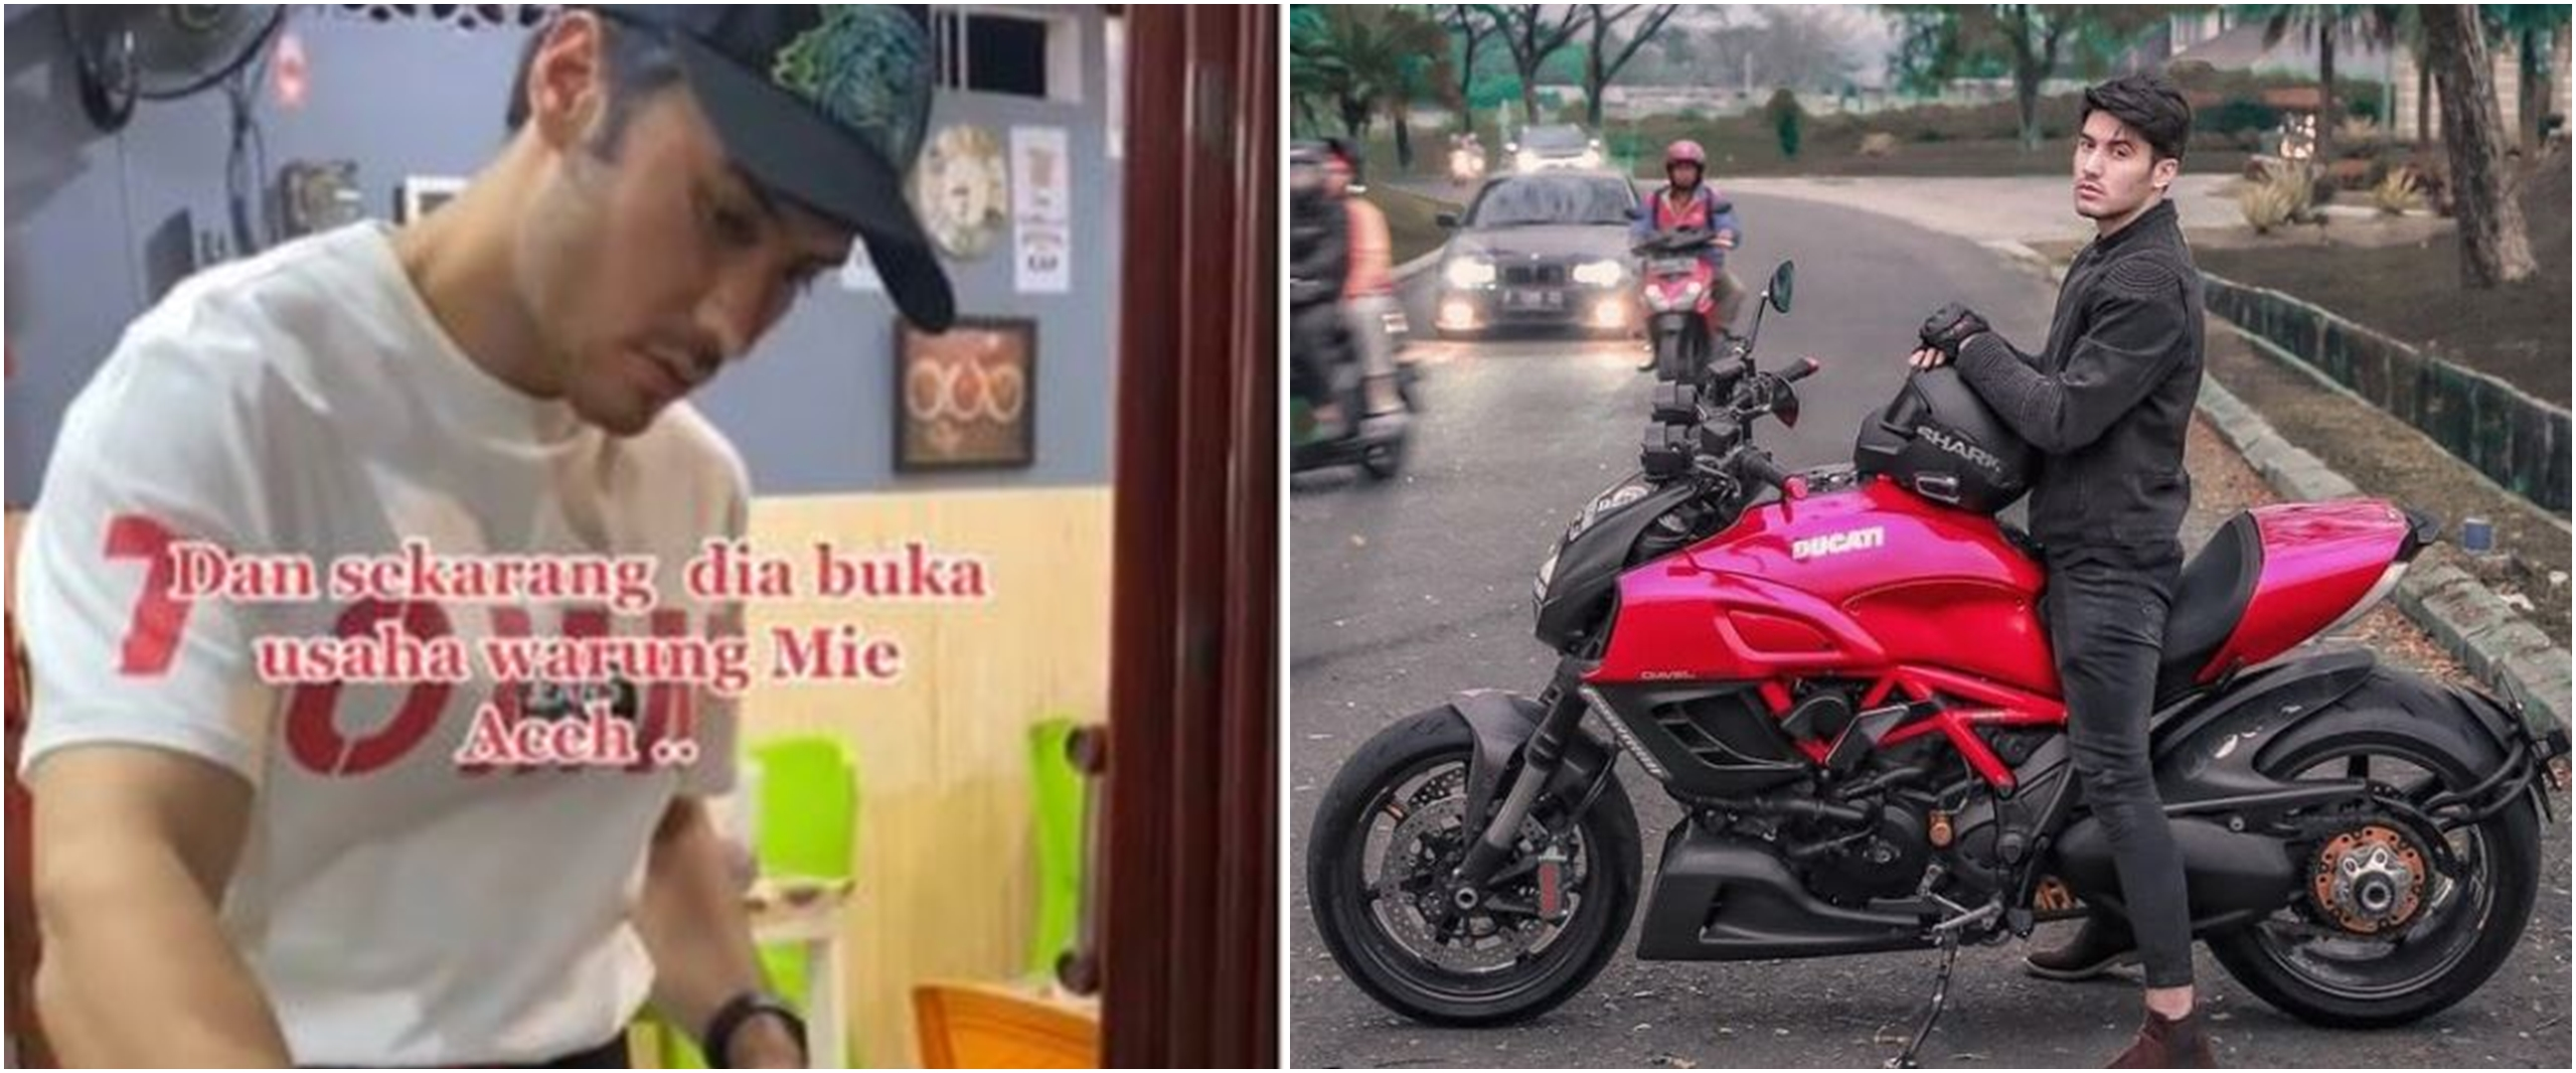 8 Potret Bara Valentino, penjual mi Aceh ganteng yang curi perhatian